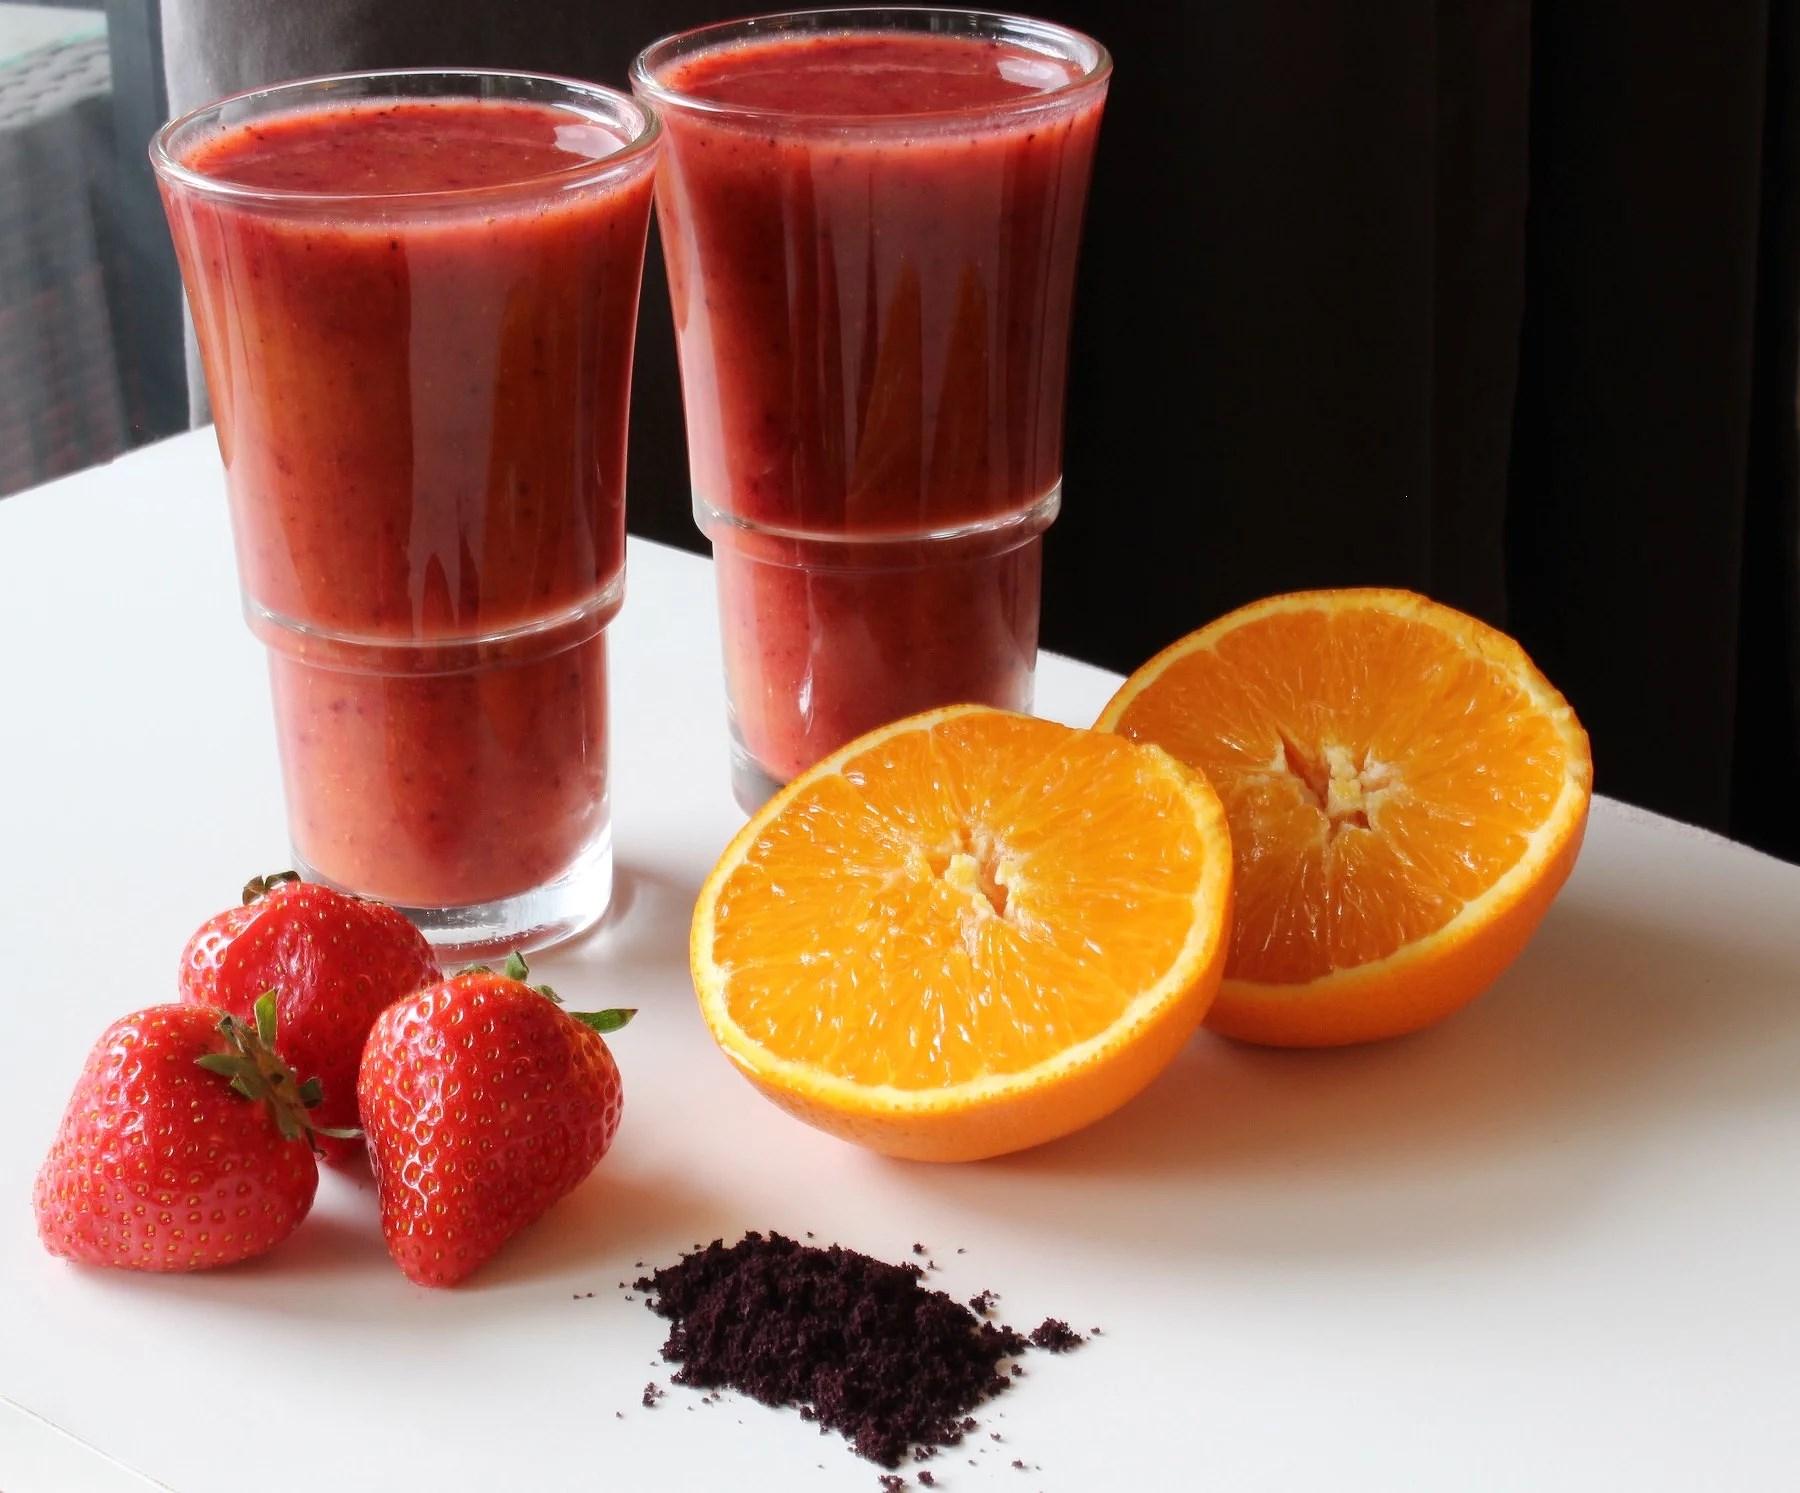 Vitamin Boost Juice: Orange+Strawberry+Acai